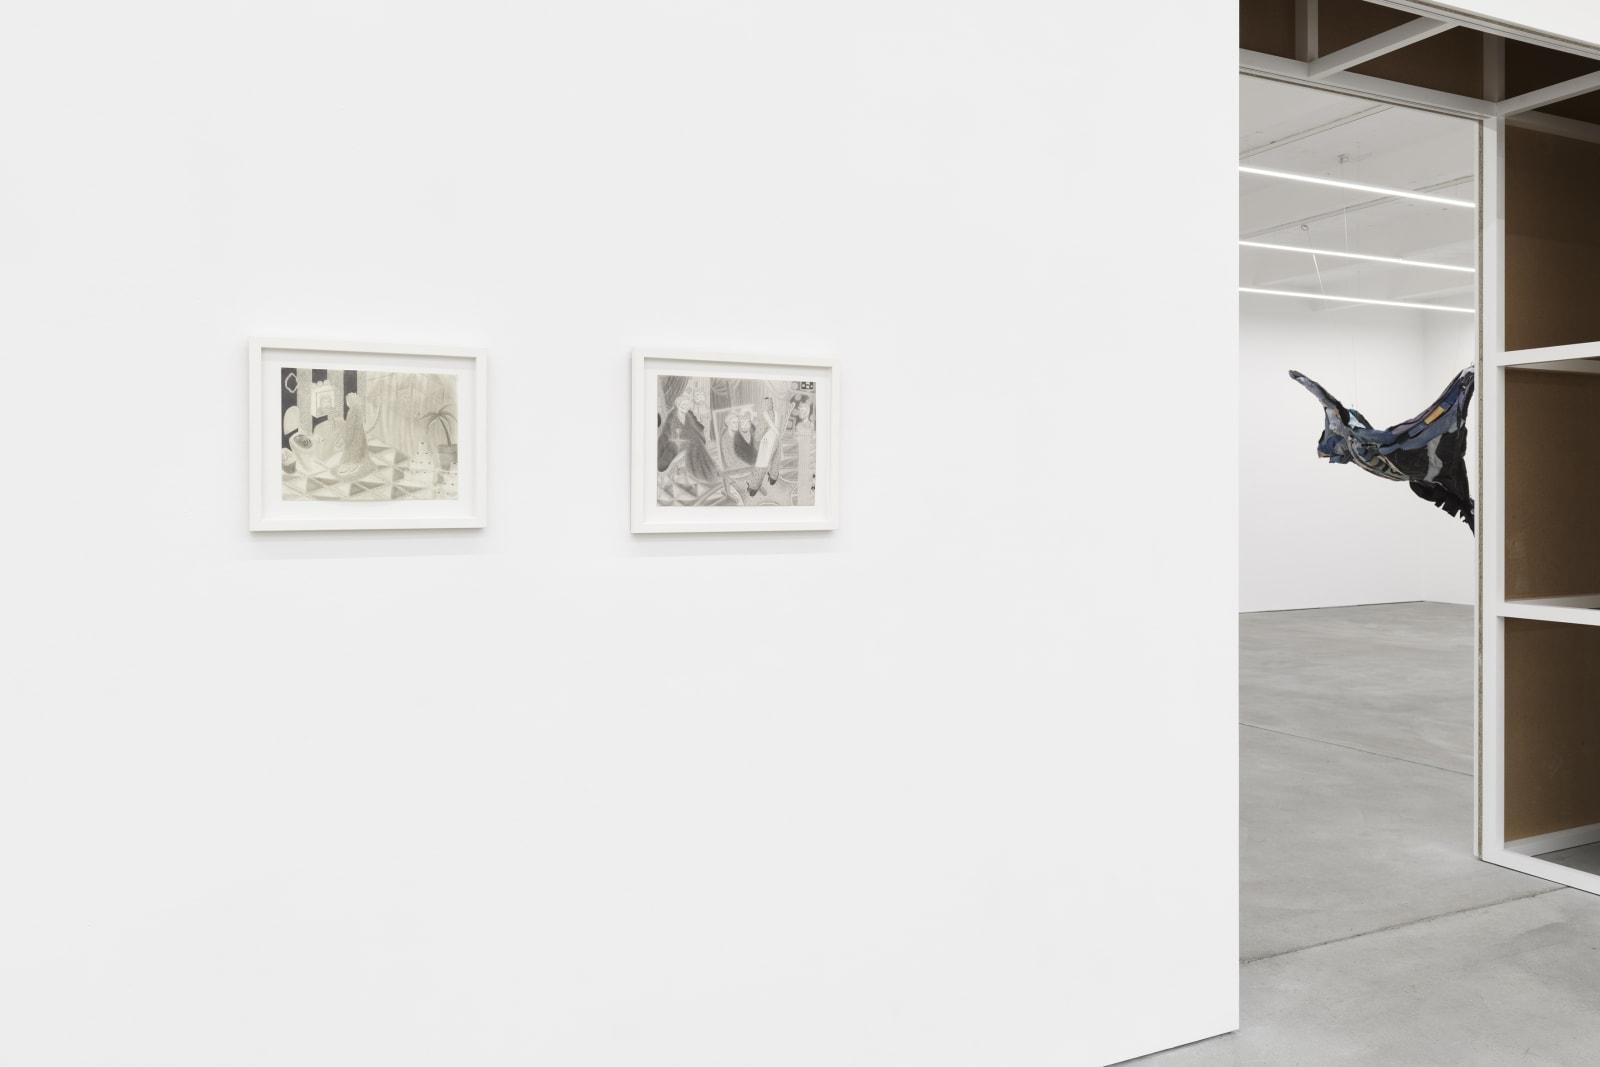 KYUNG-ME, TAU LEWIS exhibition view, Liminal States, Kraupa-Tuskany Zeidler, Berlin 2019-2020